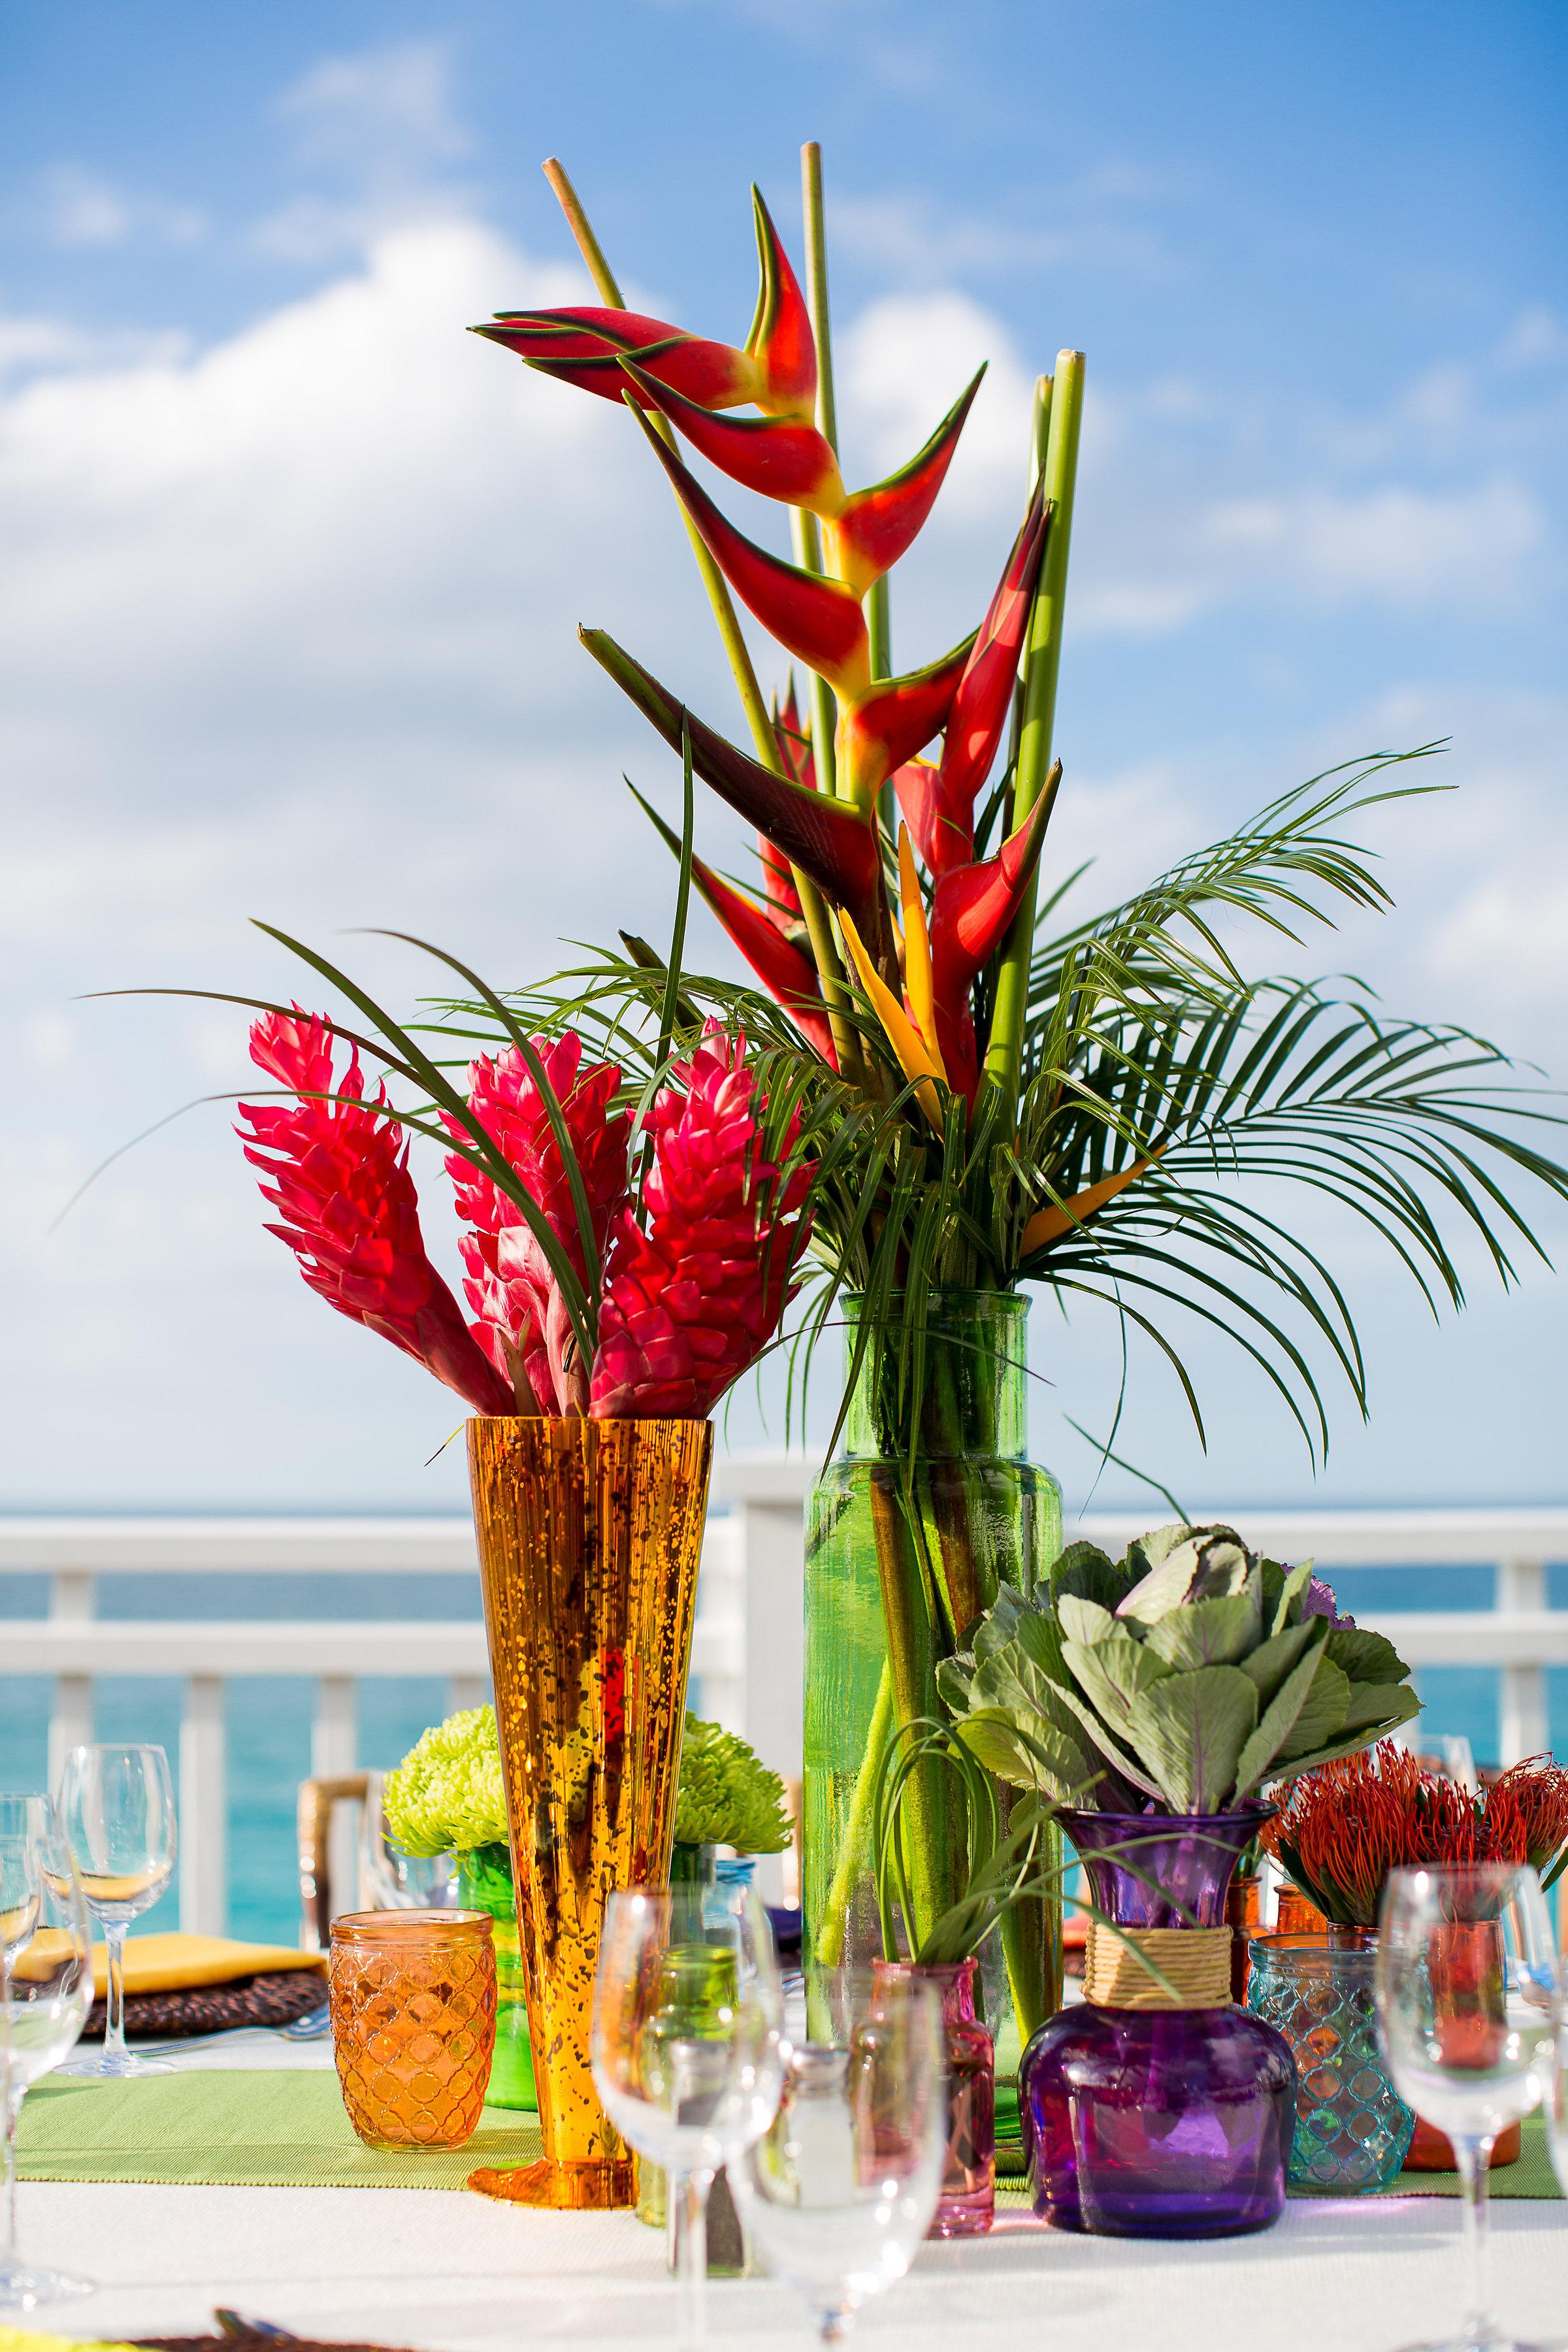 Ceci_New_York_Ceci_Style_Ceci_Johnson_Luxury_Lifestyle_Destination_Bahamas_Wedding_Letterpress_Inspiration_Design_Custom_Couture_Personalized_Invitations_25.jpg